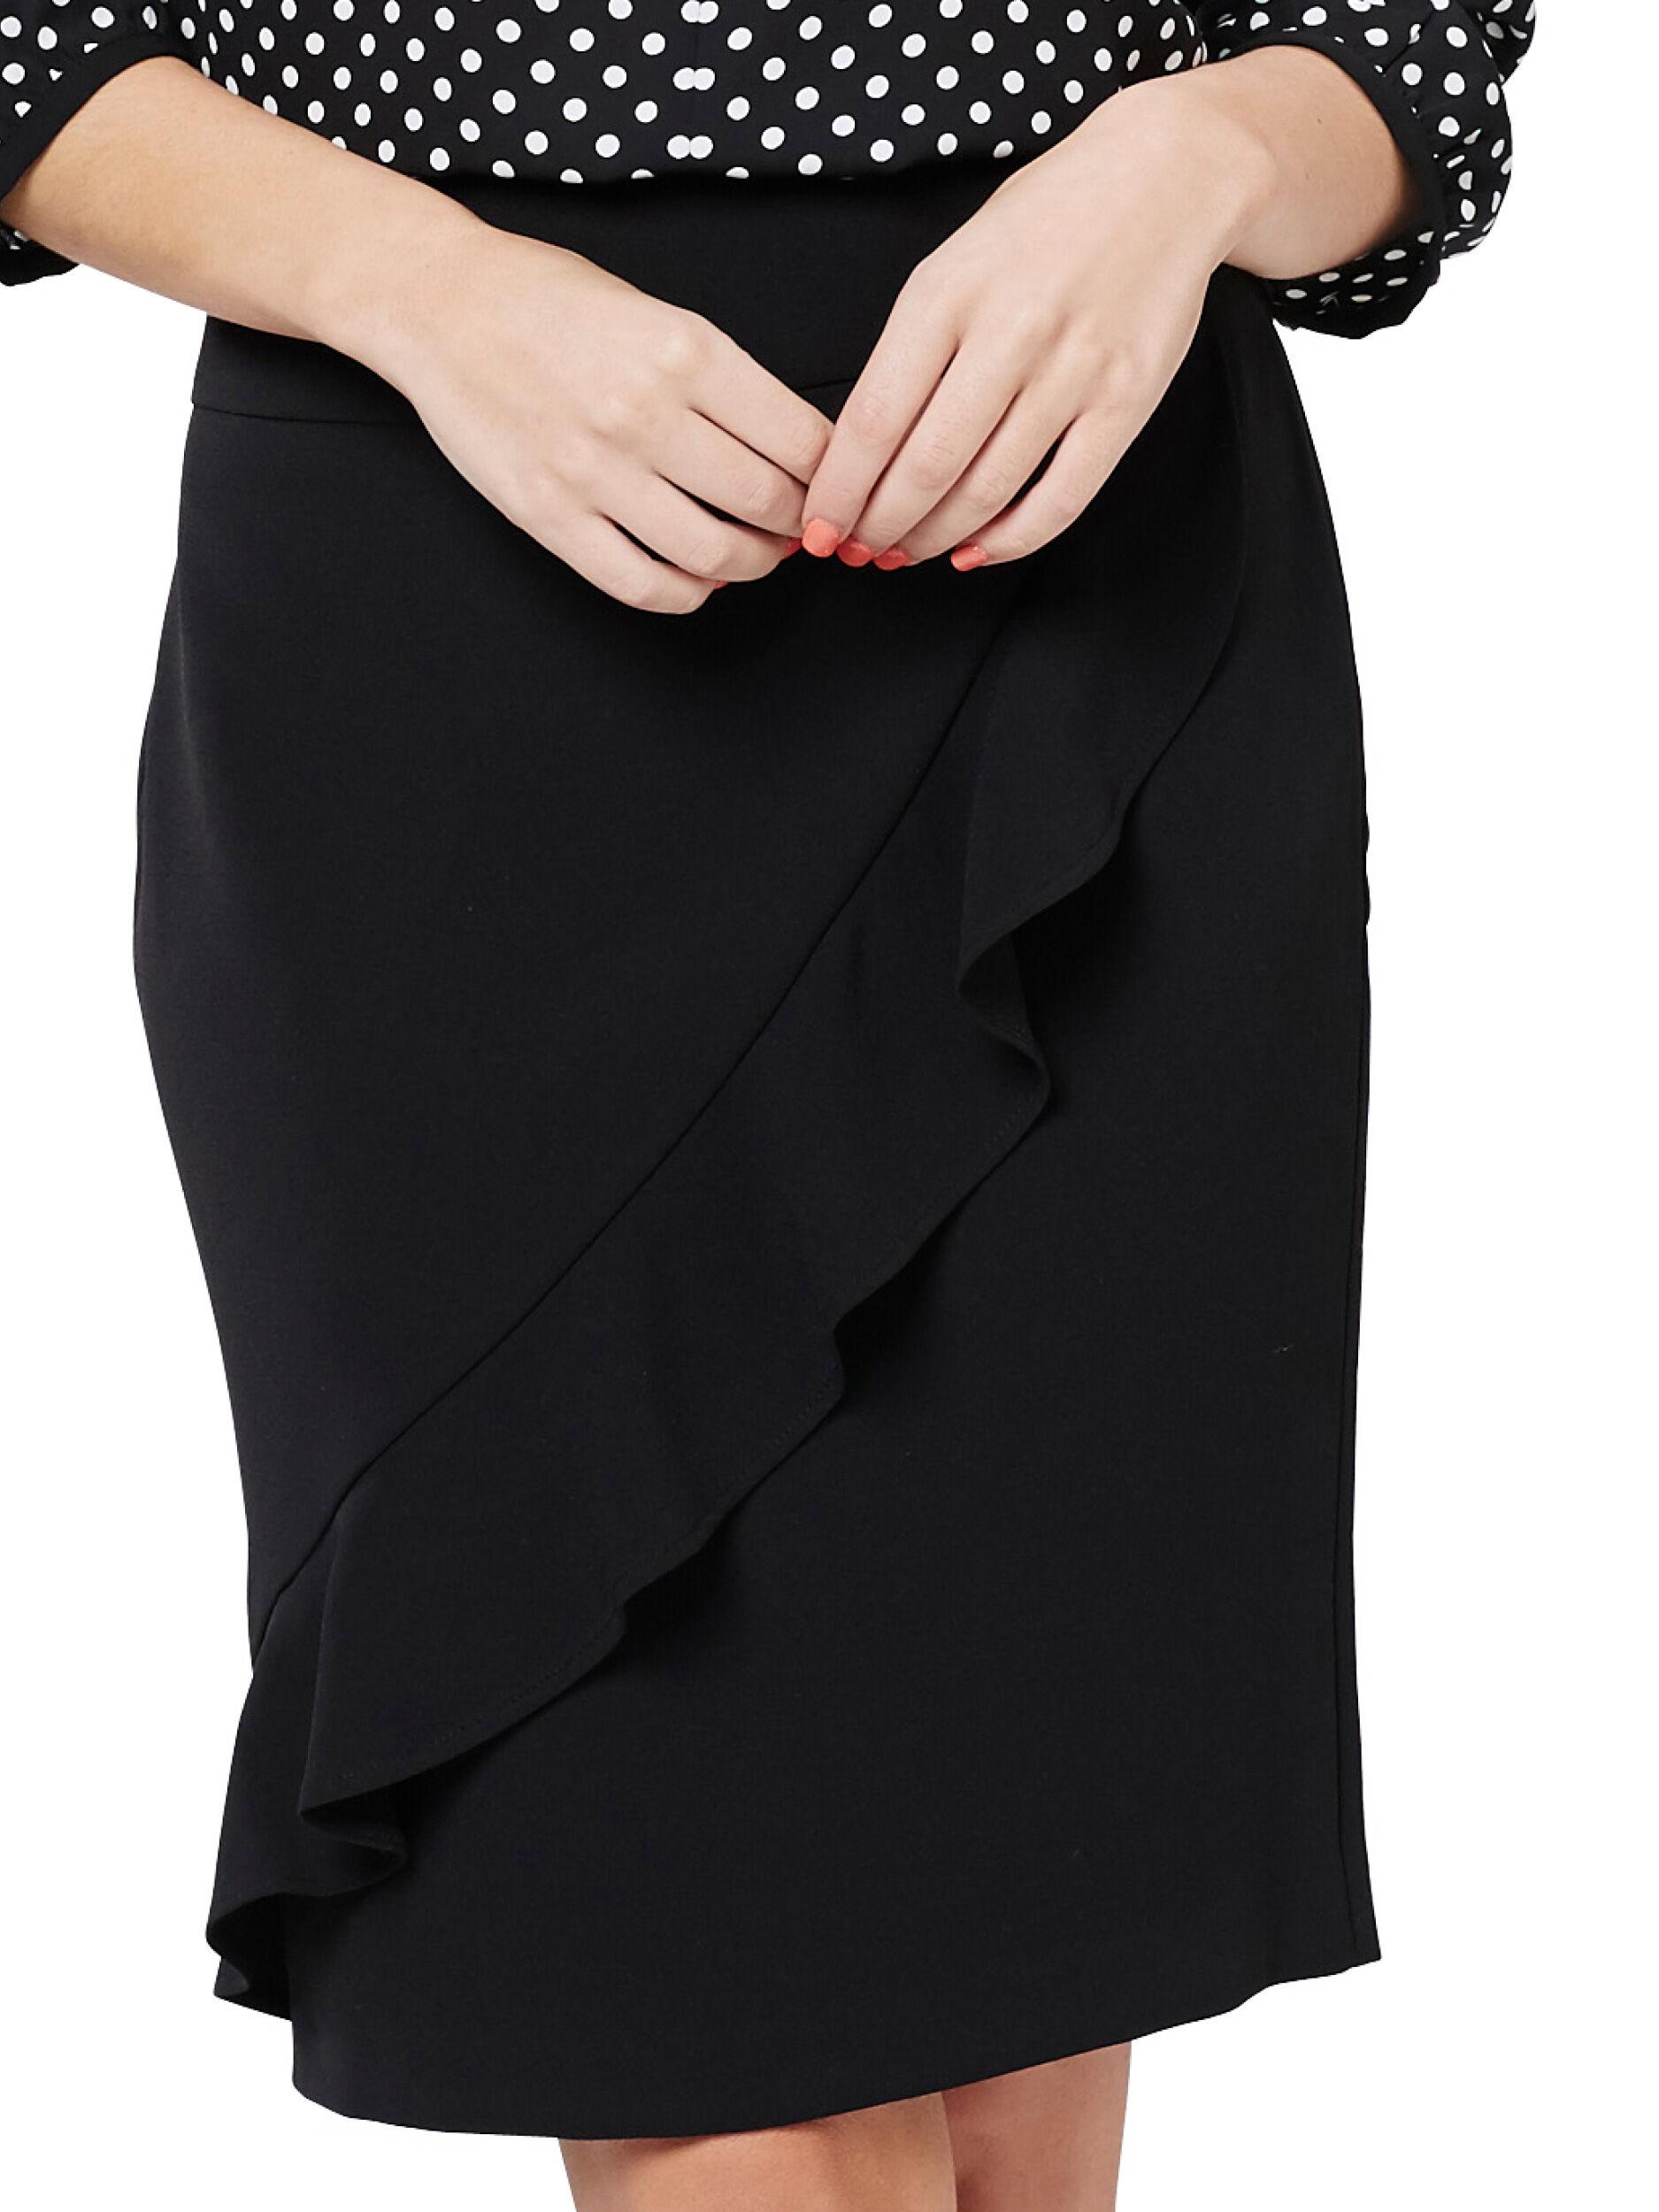 My Bella Skirt